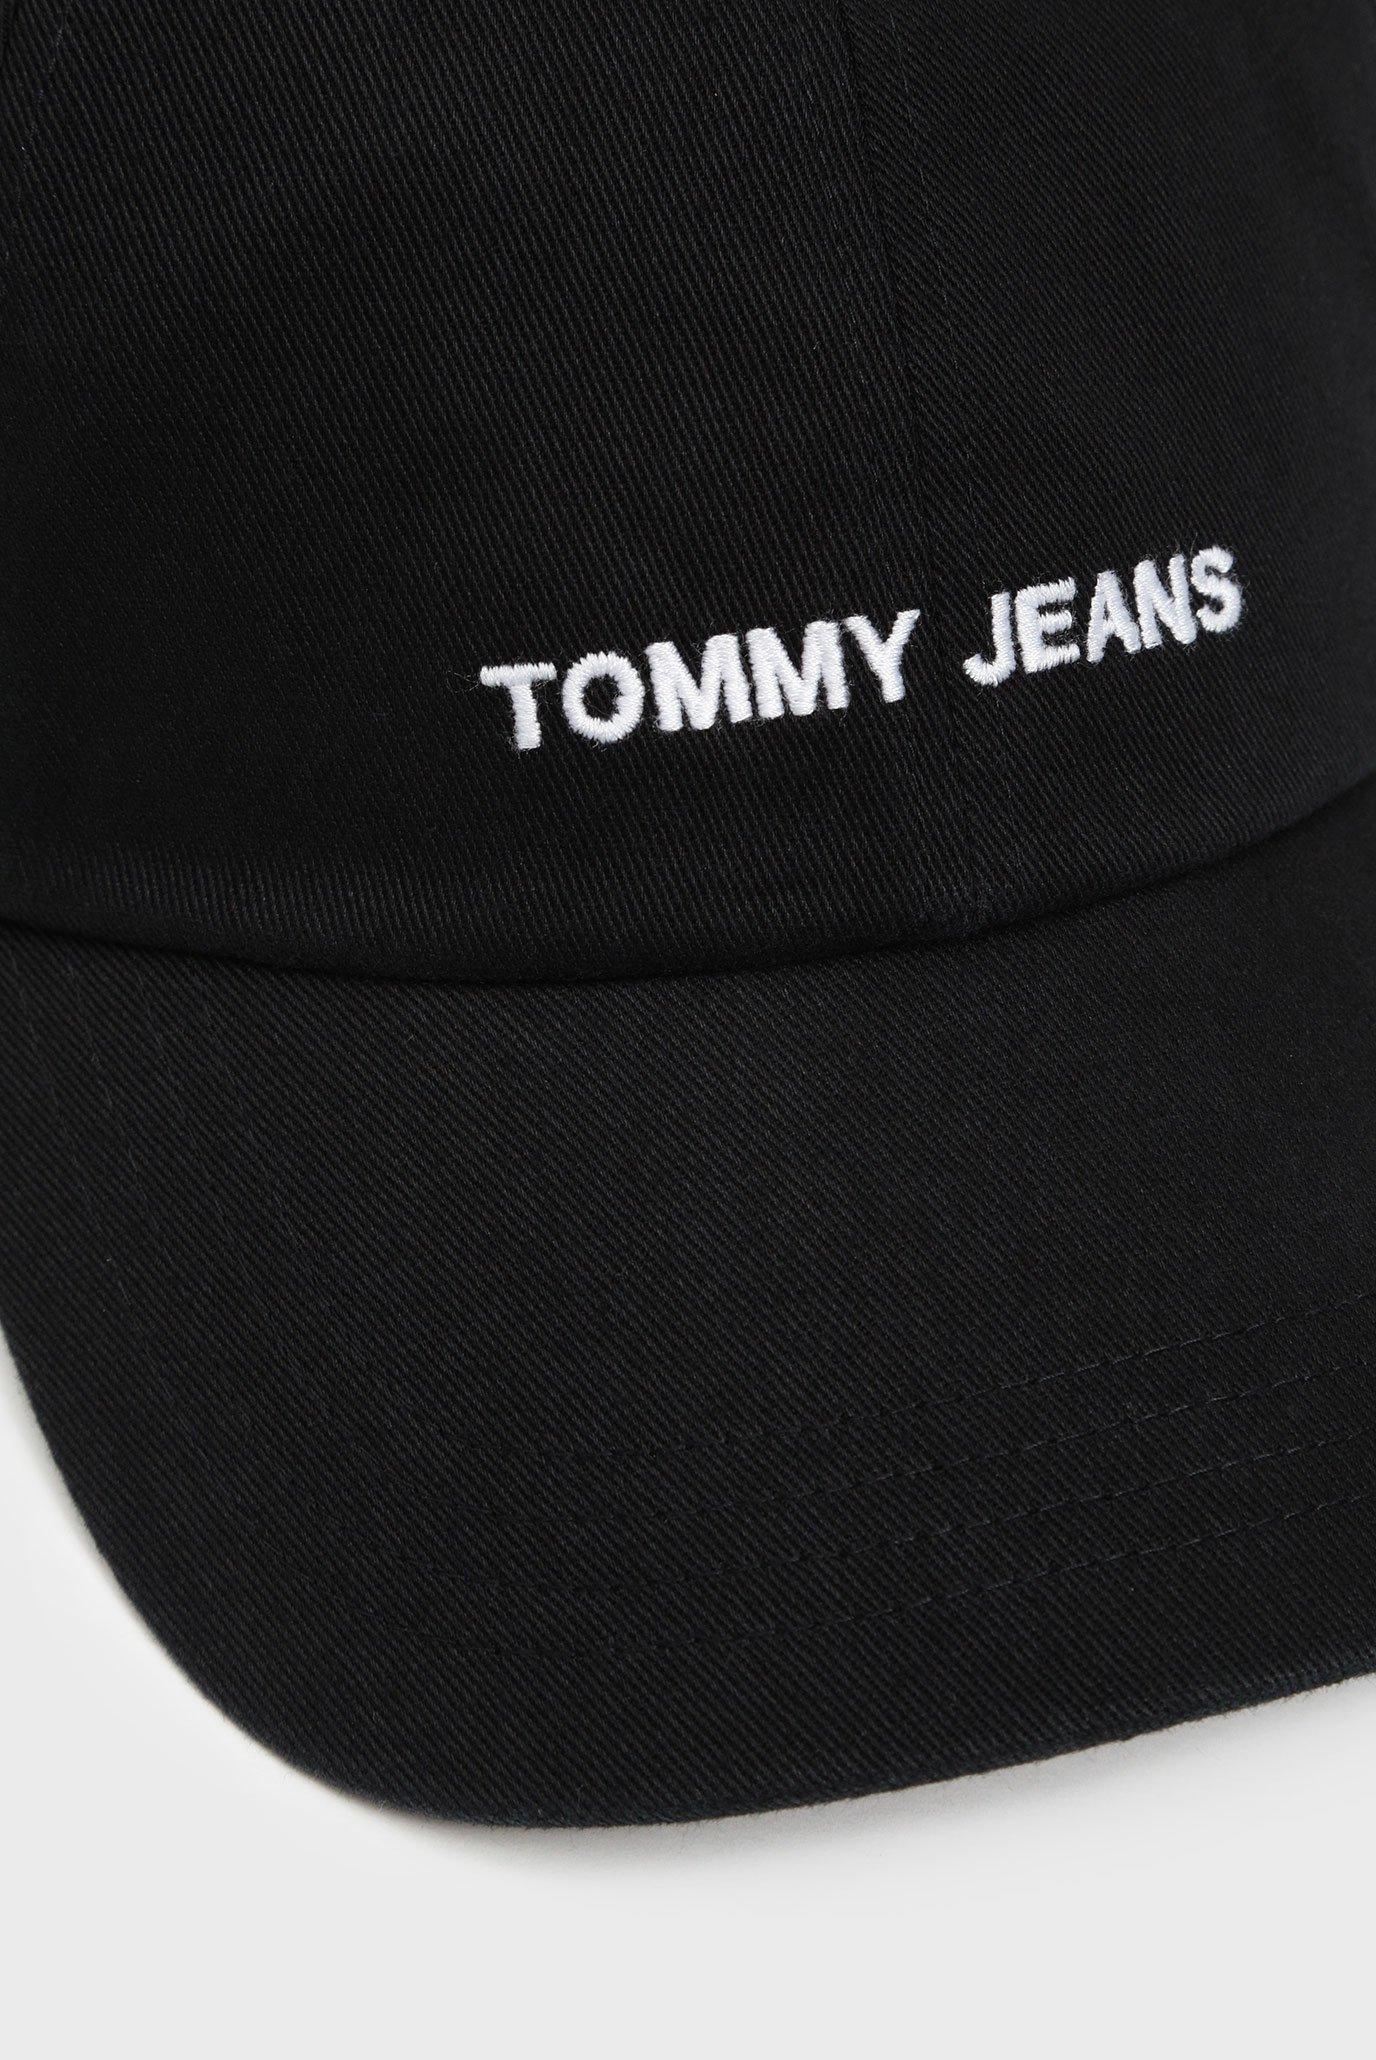 Мужская черная кепка TJM SPORT Tommy Jeans